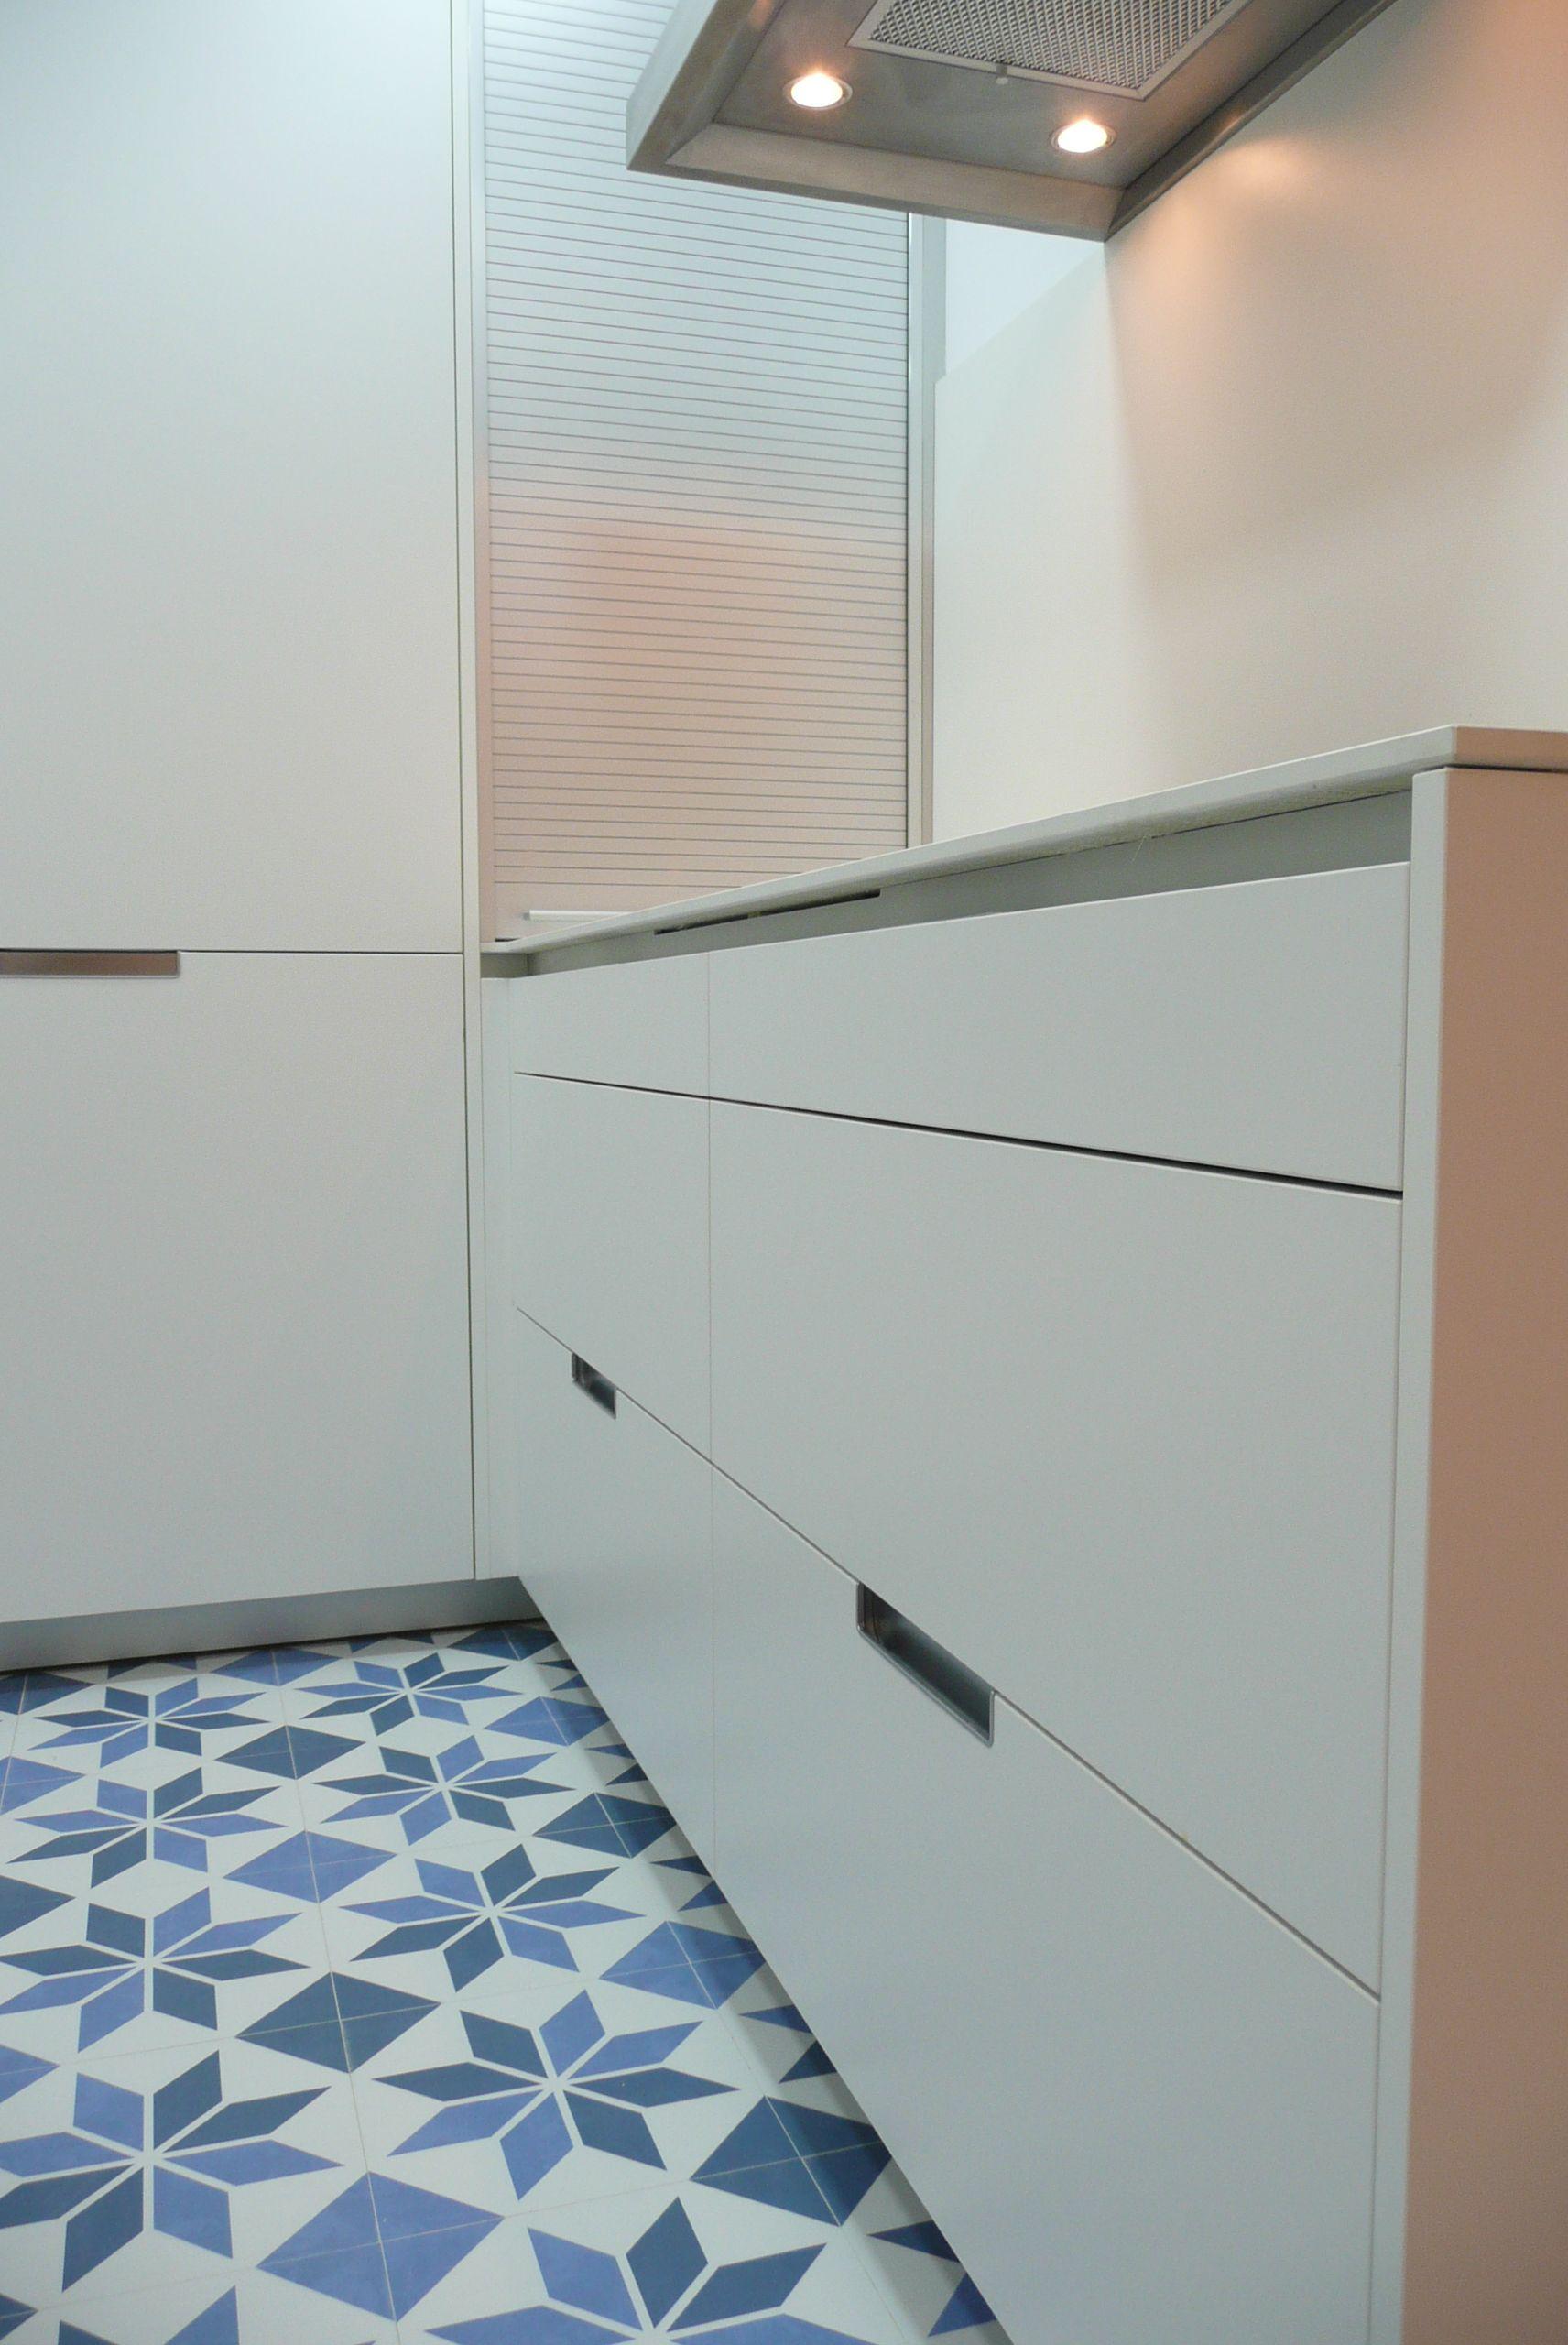 Cocina santos cajoneras de 90cm con 3 gavetas serie minos for Cajoneras de cocina